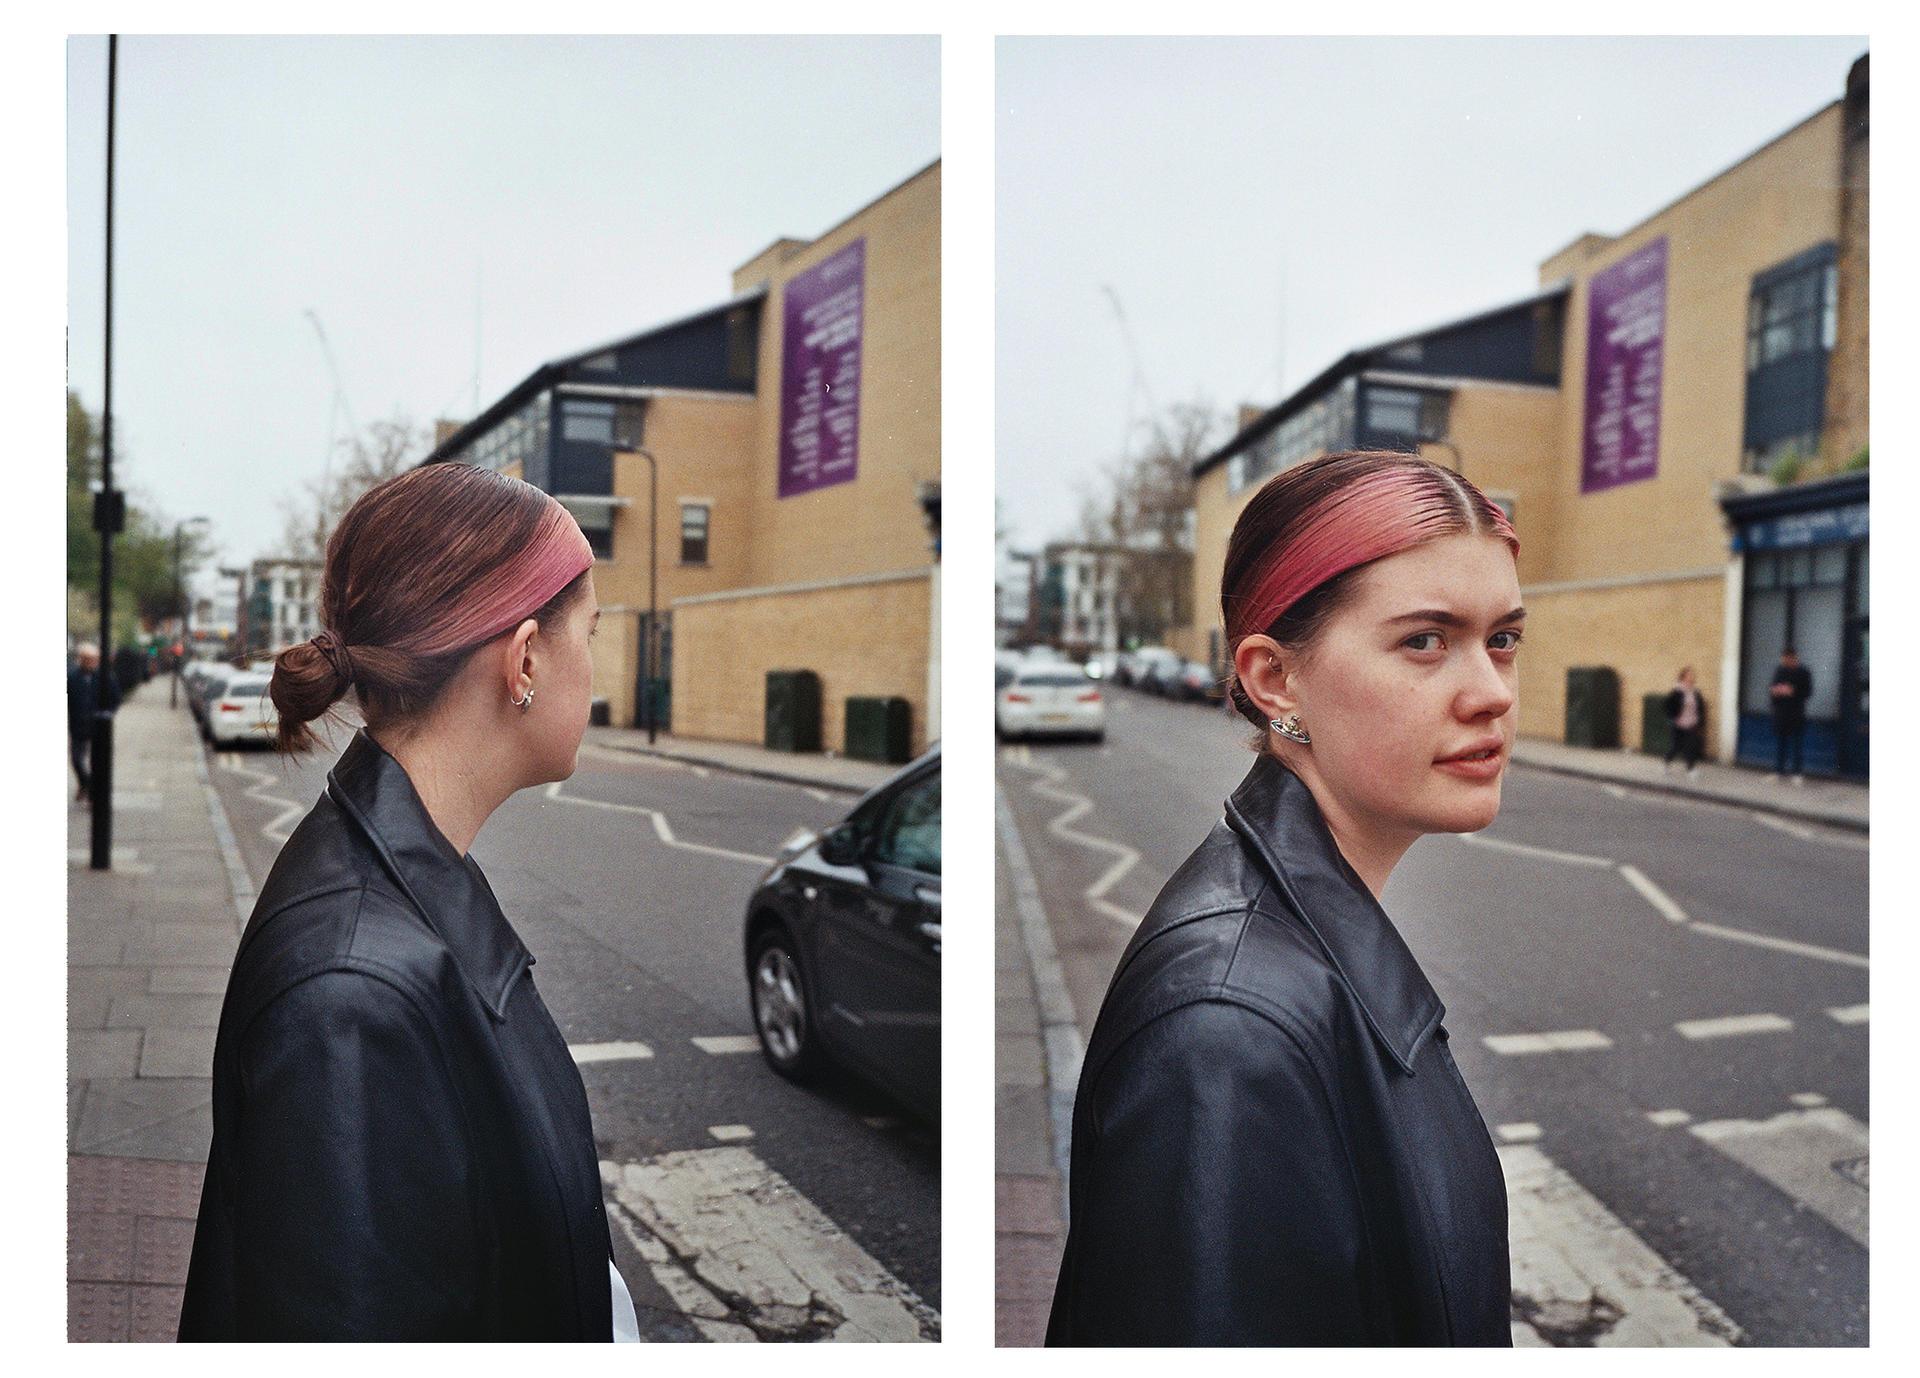 FI, LONDON